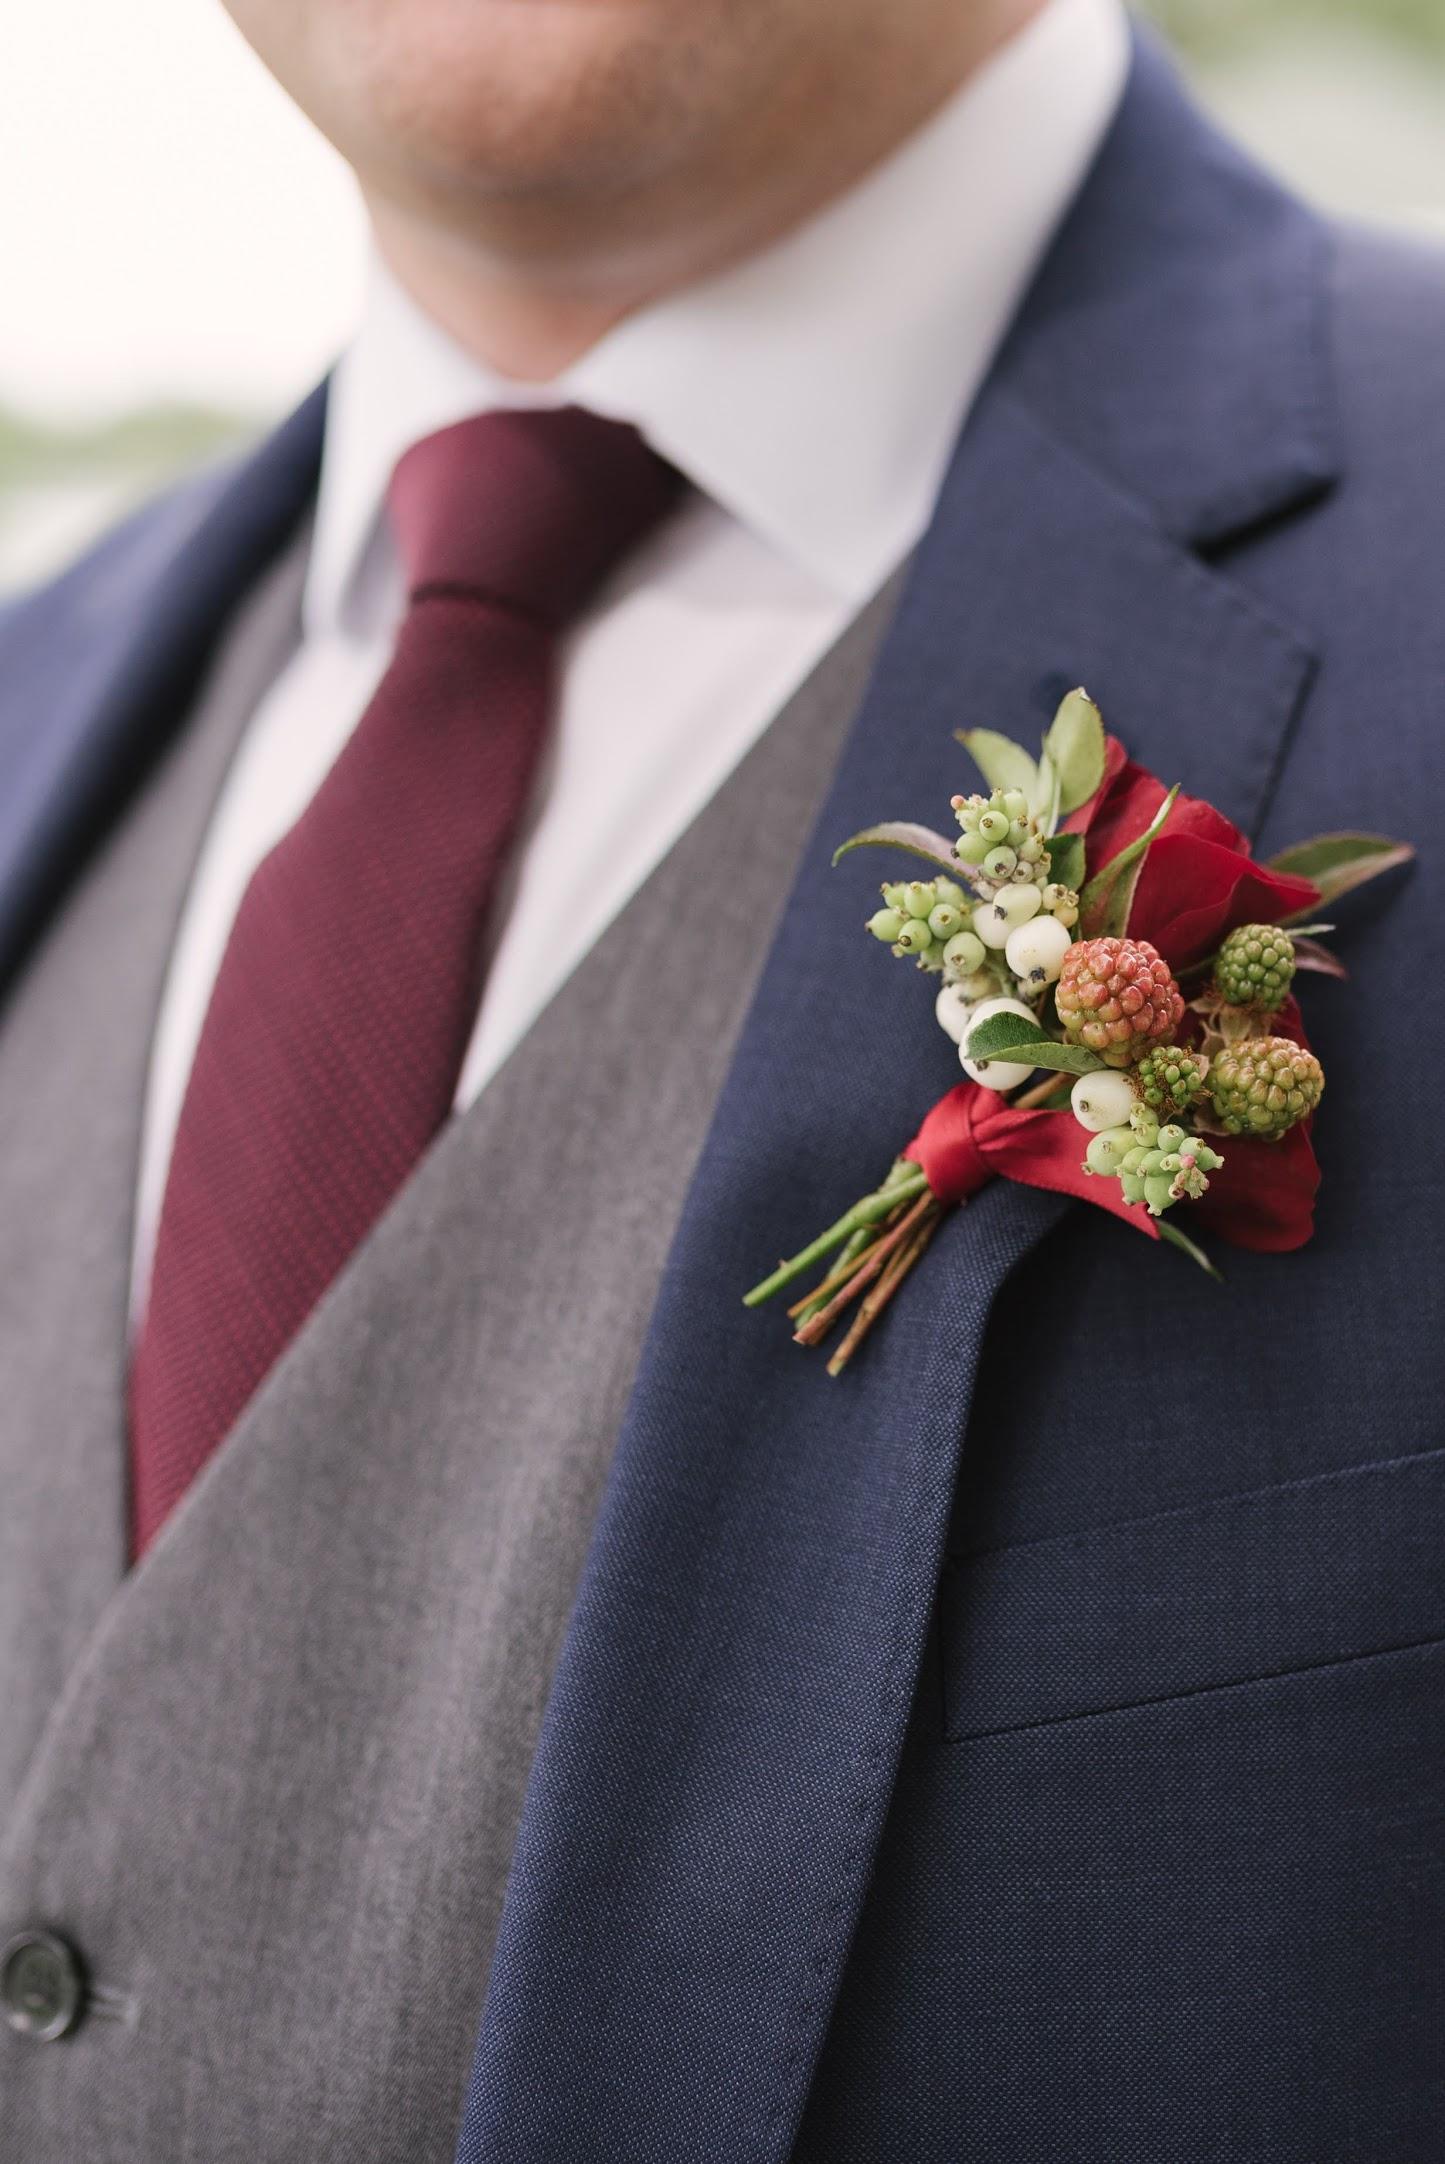 Field-Gems-Photography-Detroit-Michigan-Wedding-Photographer-Family-Photographer-Photobooth-090818-311.jpg